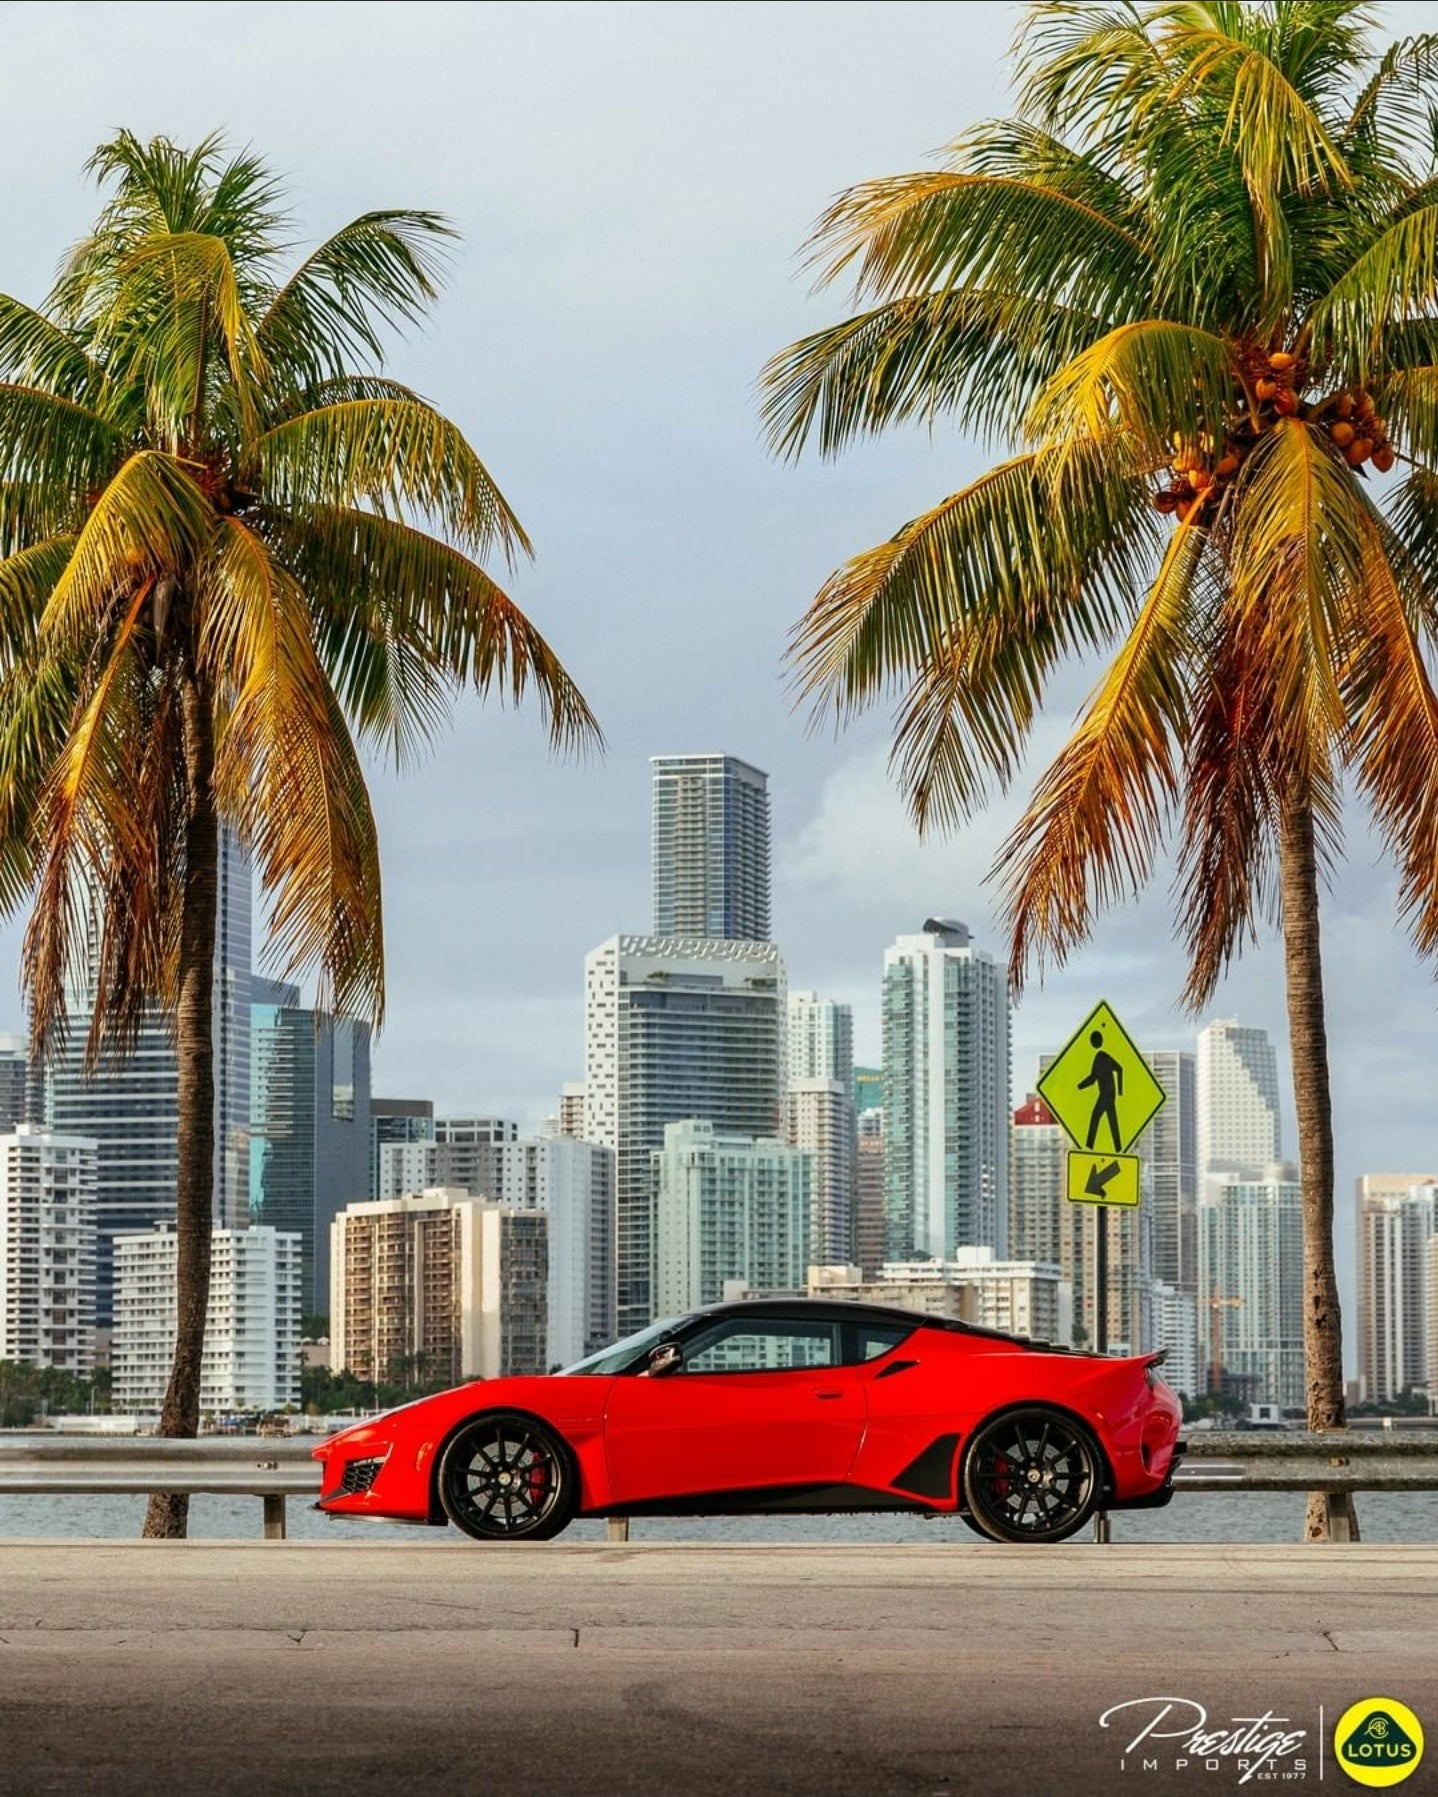 Lotus Evora GT on the Lotus of Miami Instagram account